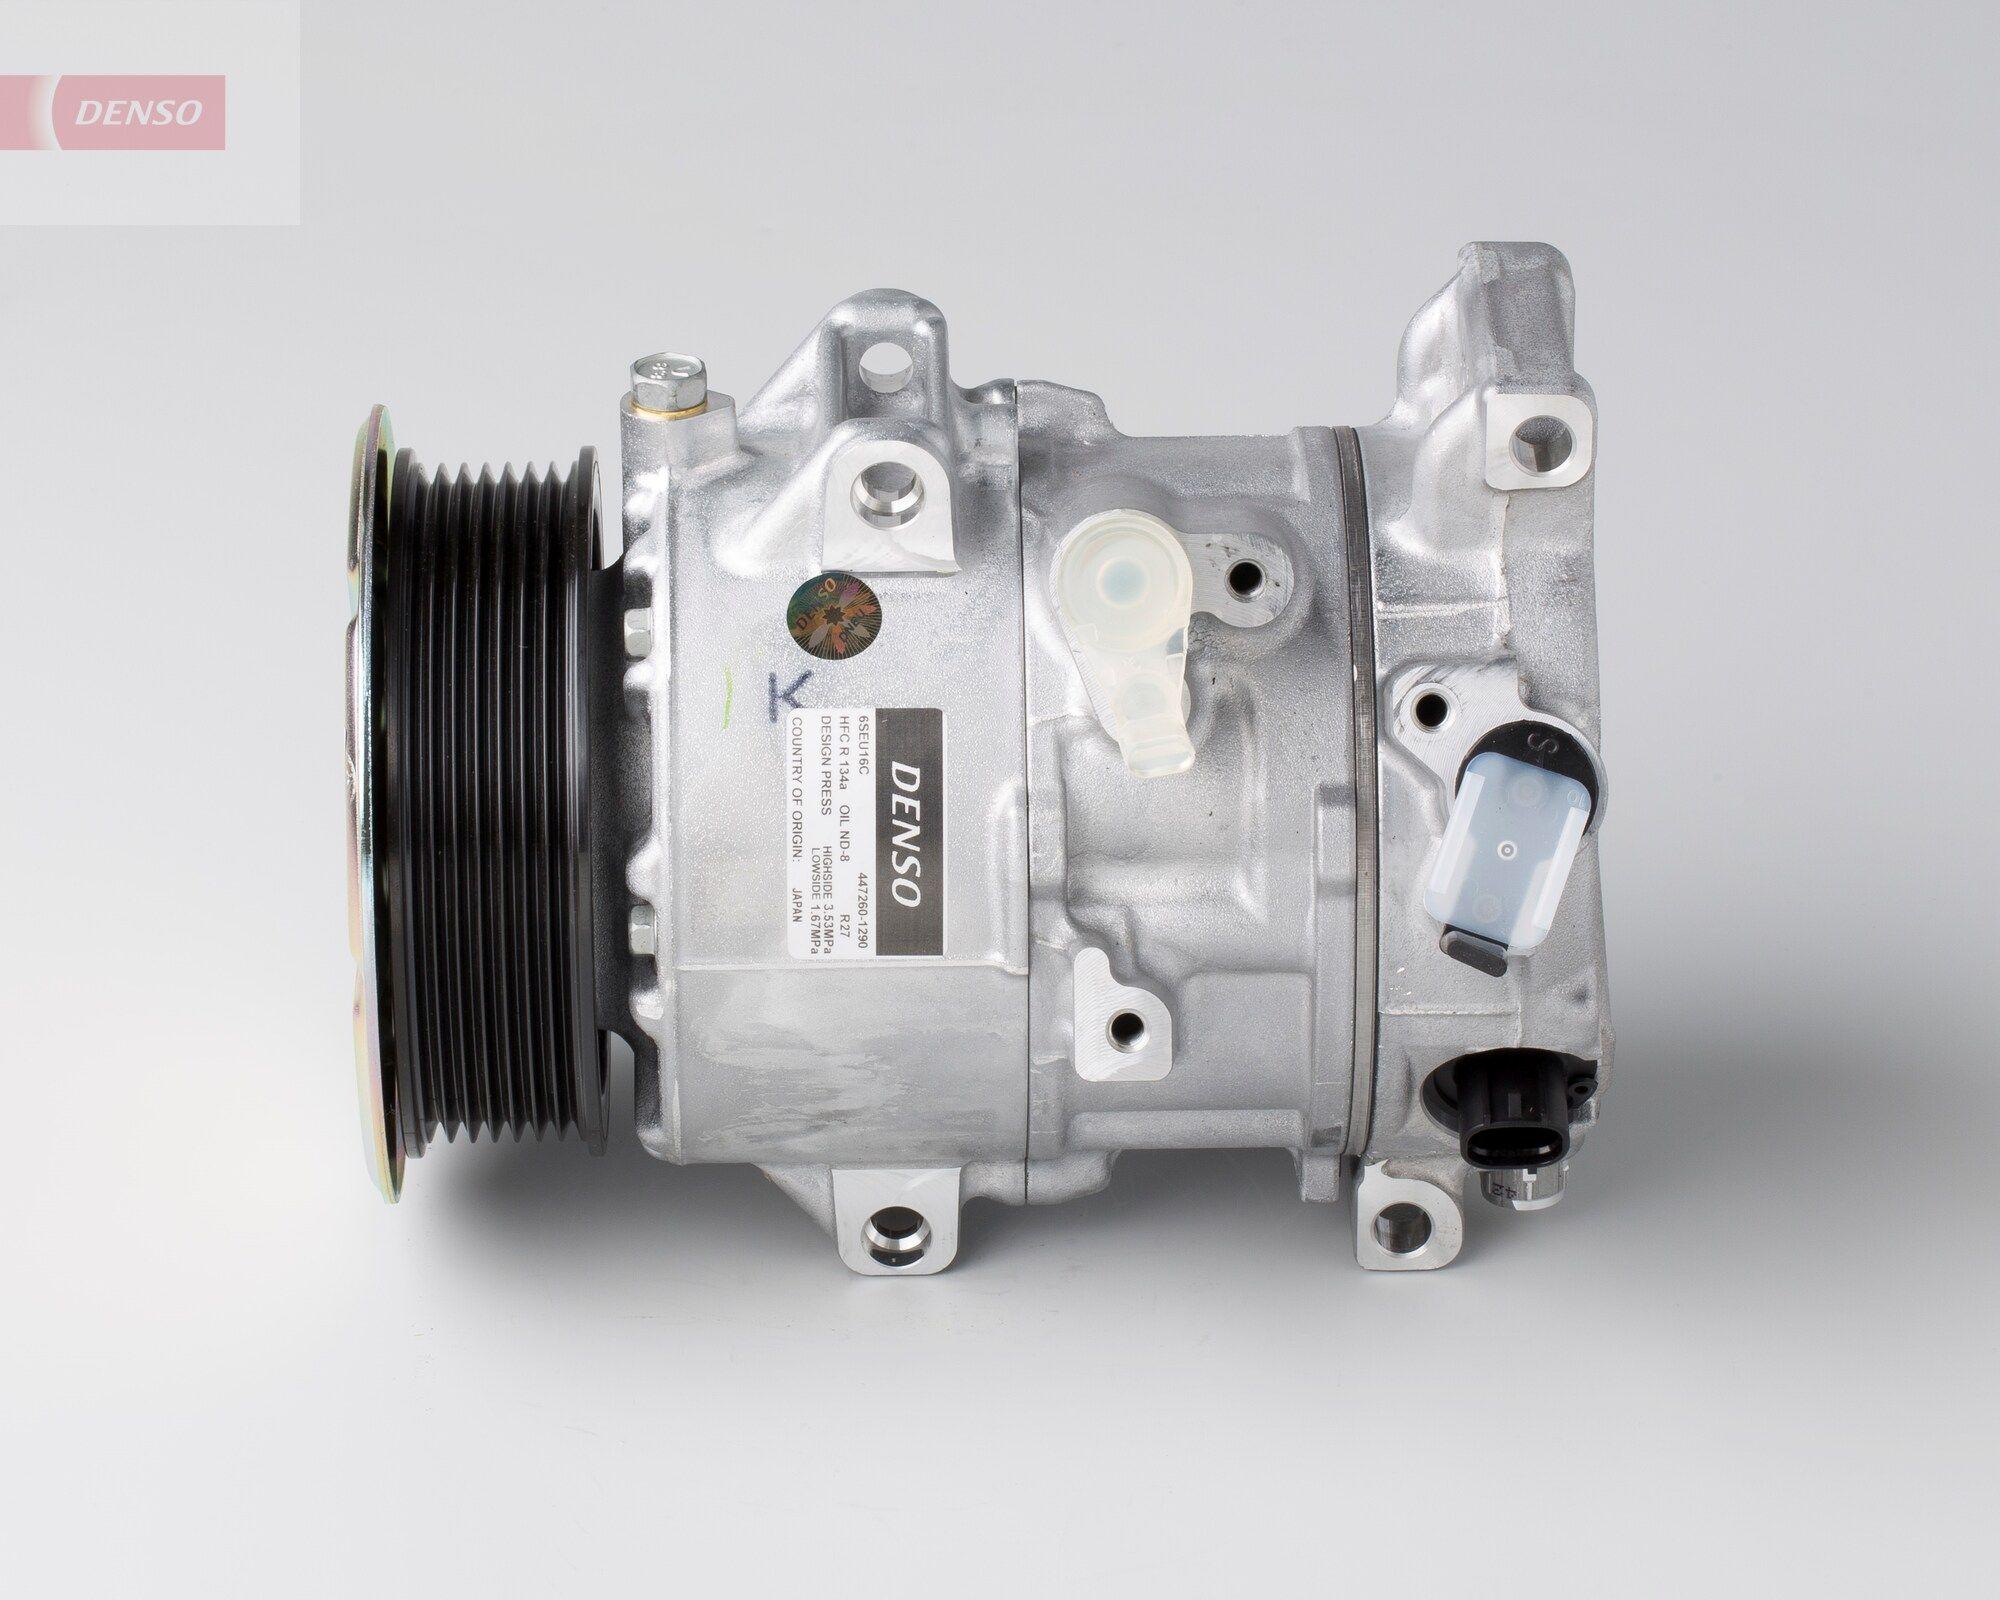 Compressor, air conditioning DCP51001 buy 24/7!